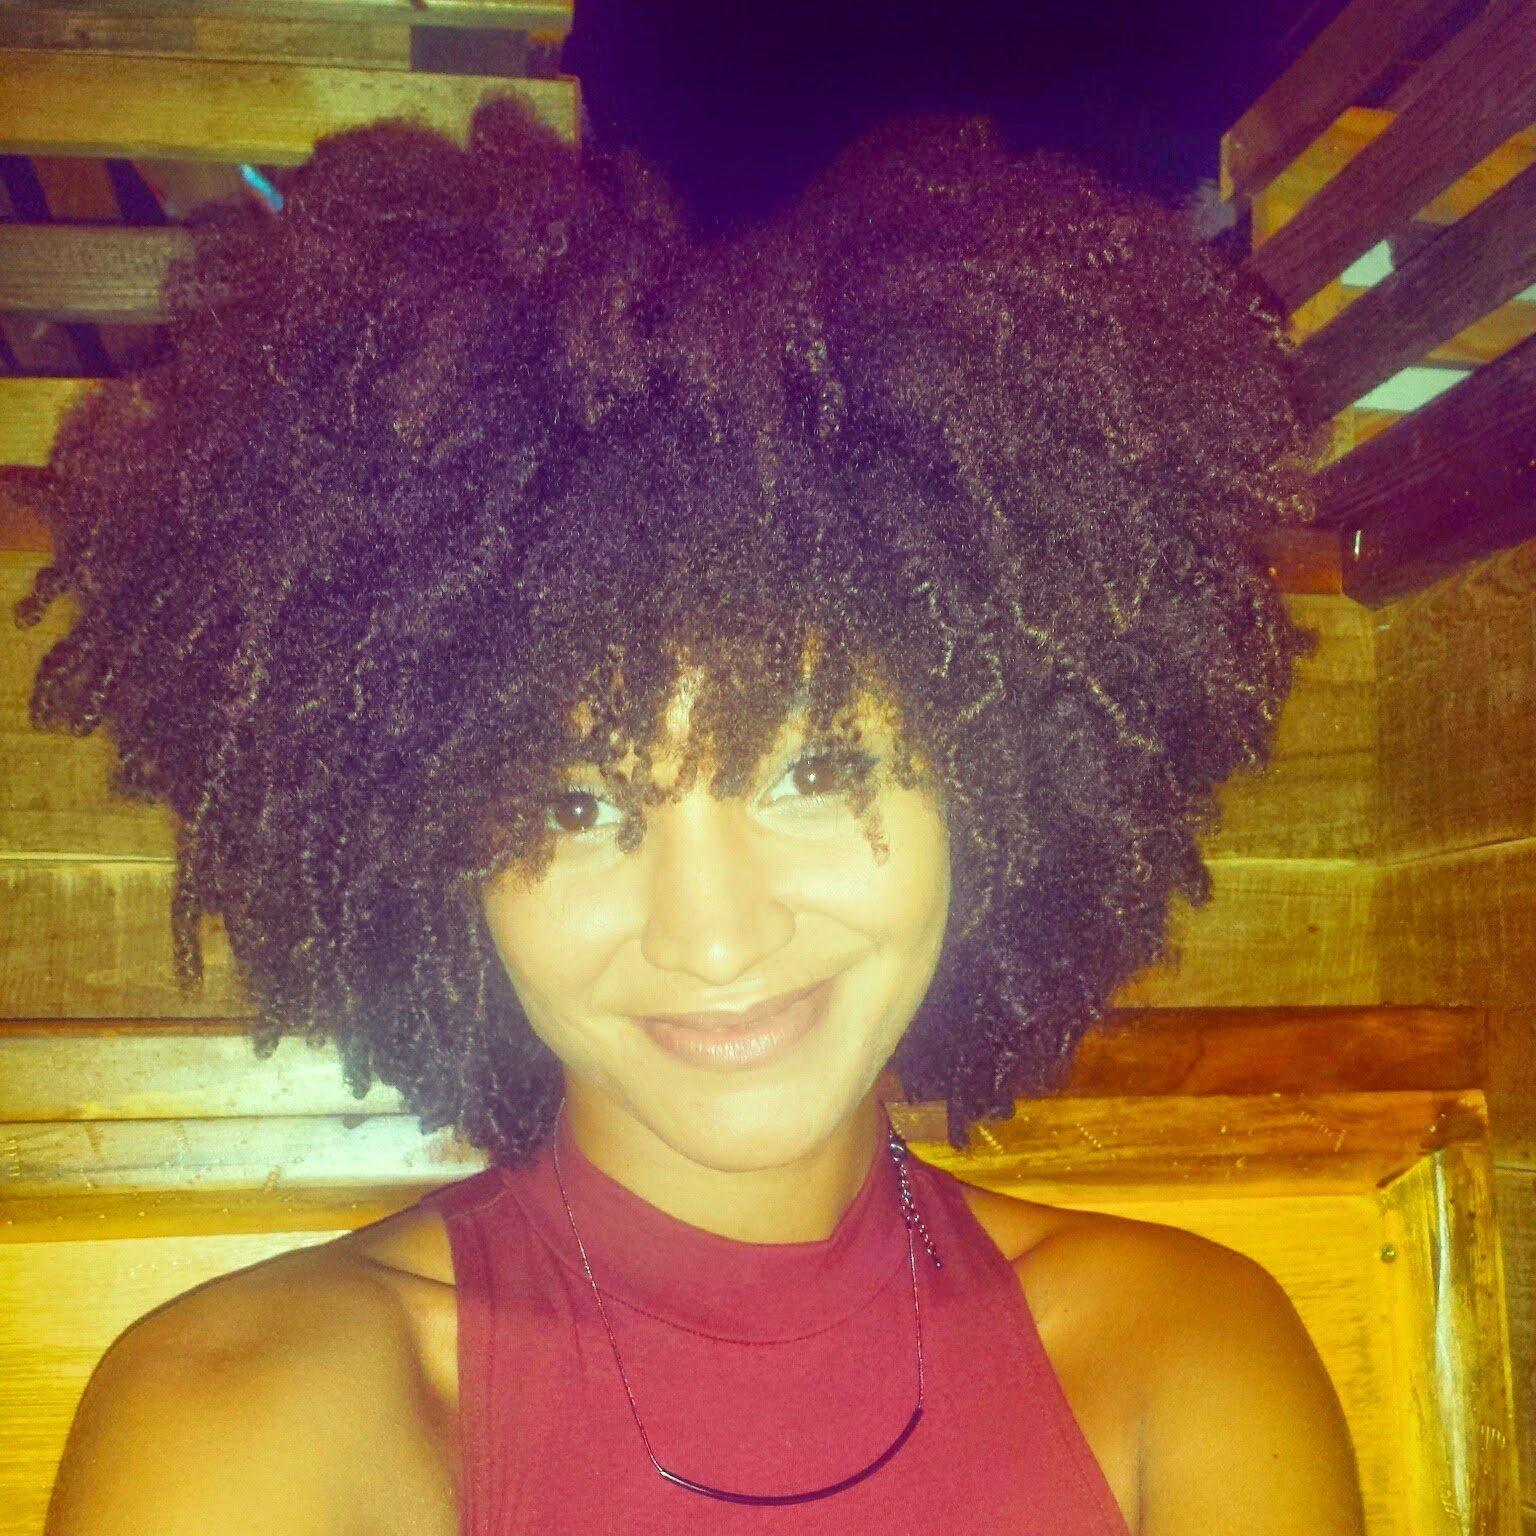 Thicker Natural Hair- Creating the Illusion of Big Hair